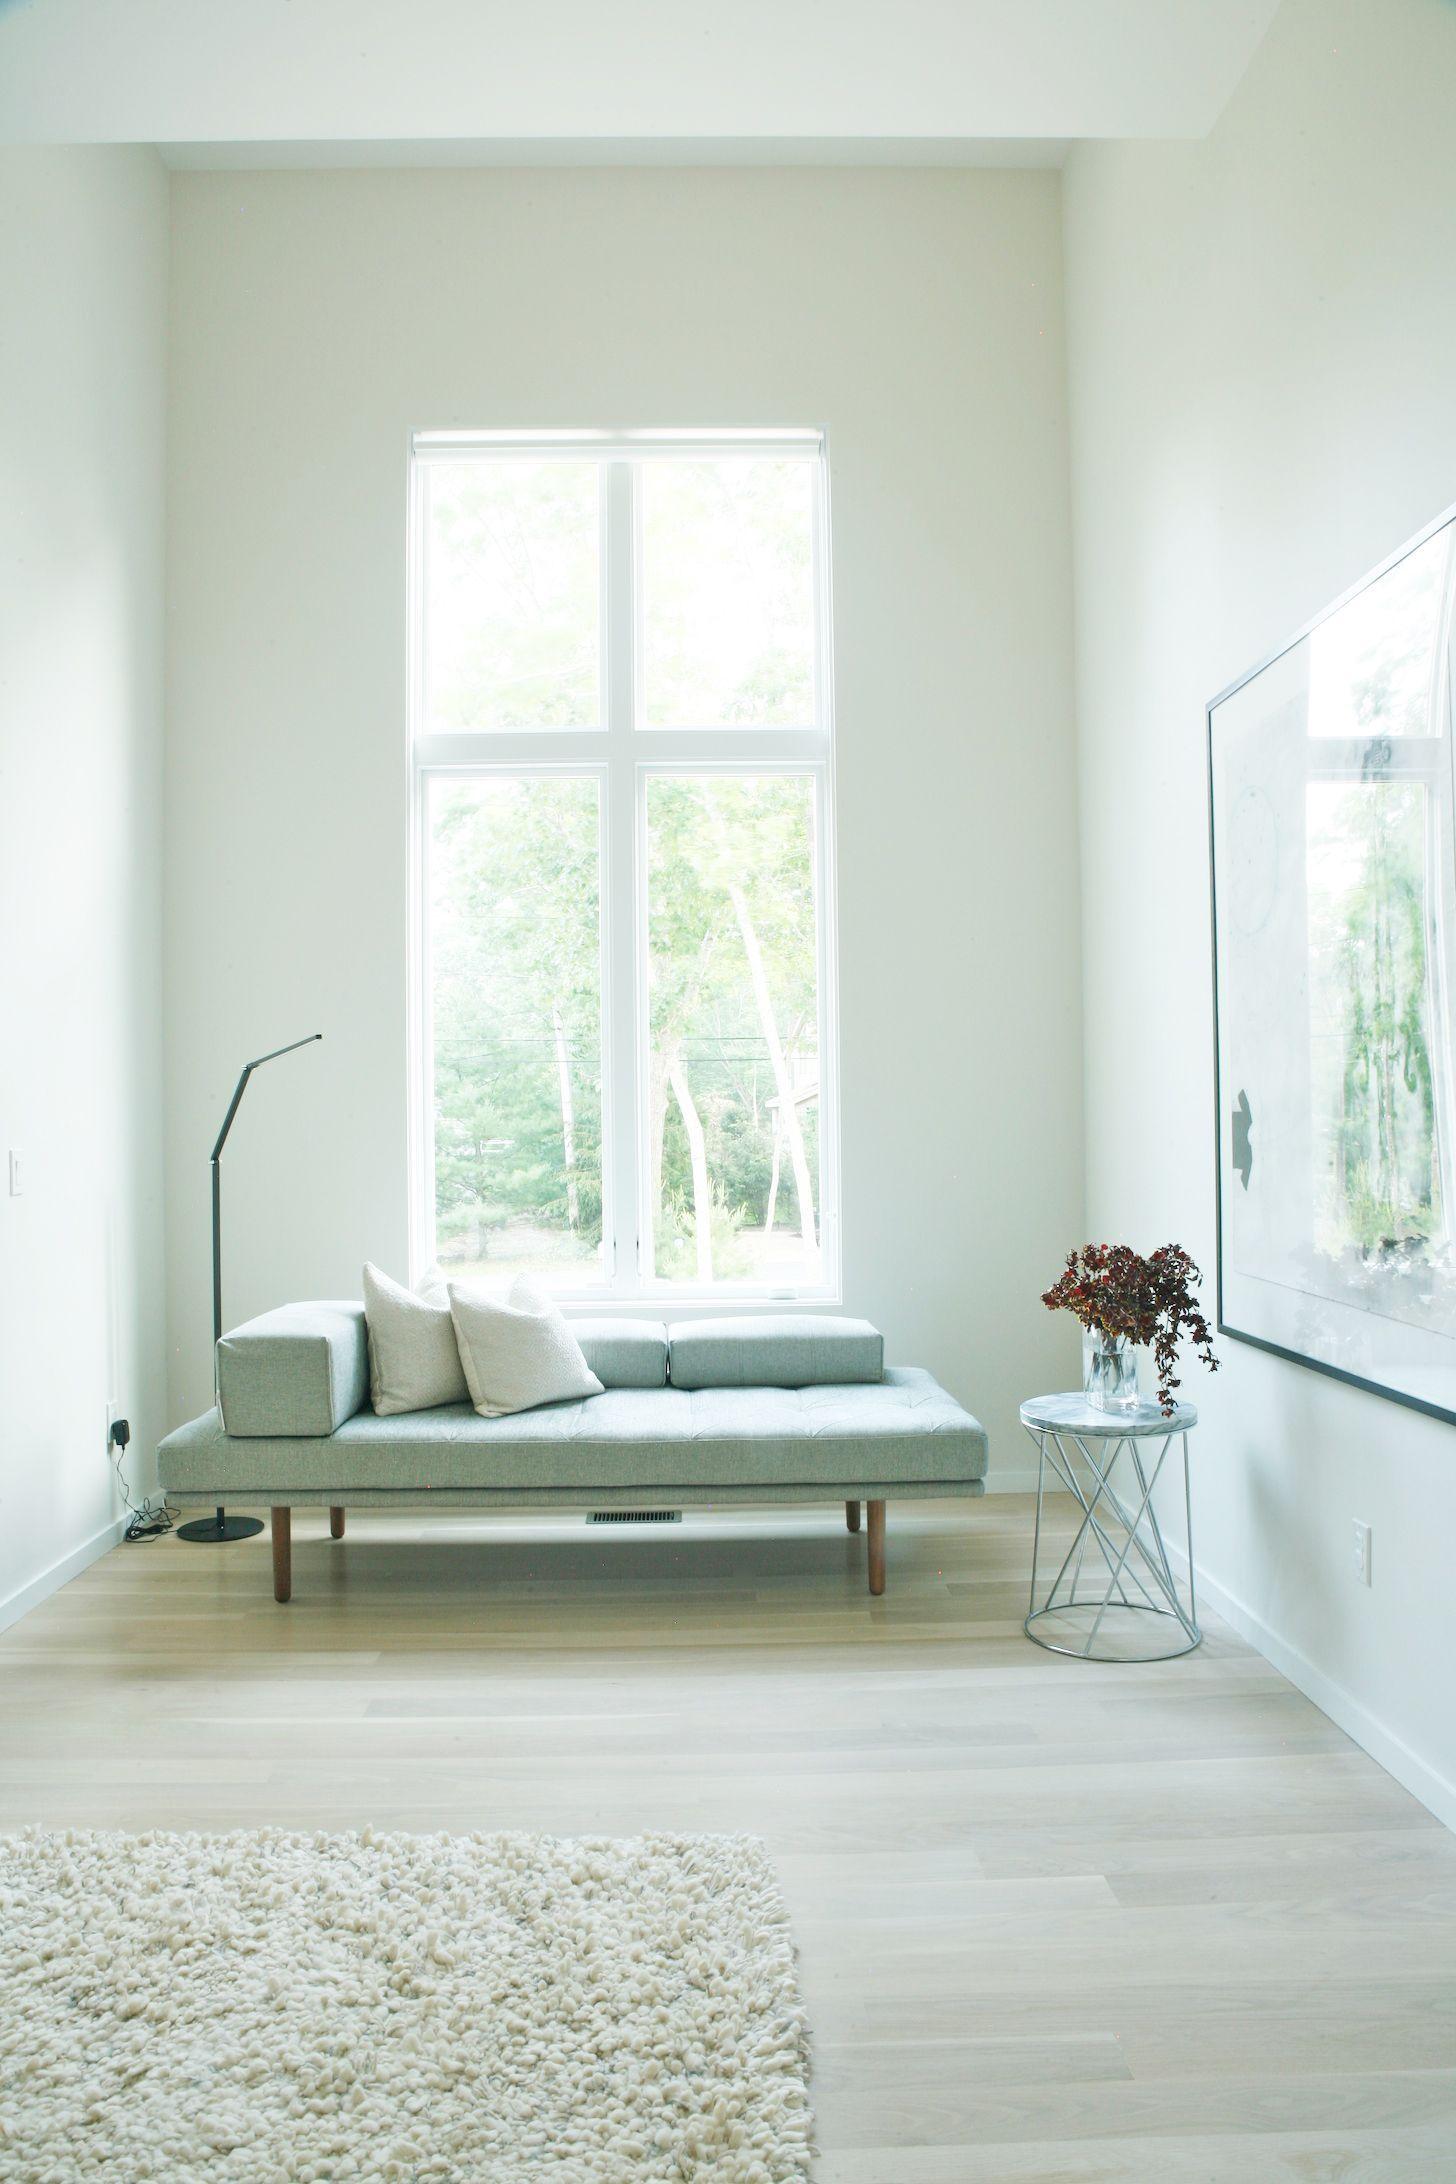 Interior Design Solution For A  Bedroom East Hampton Second Home Modern Minimalist Interiors Photo Credit Niya Bascom Photography